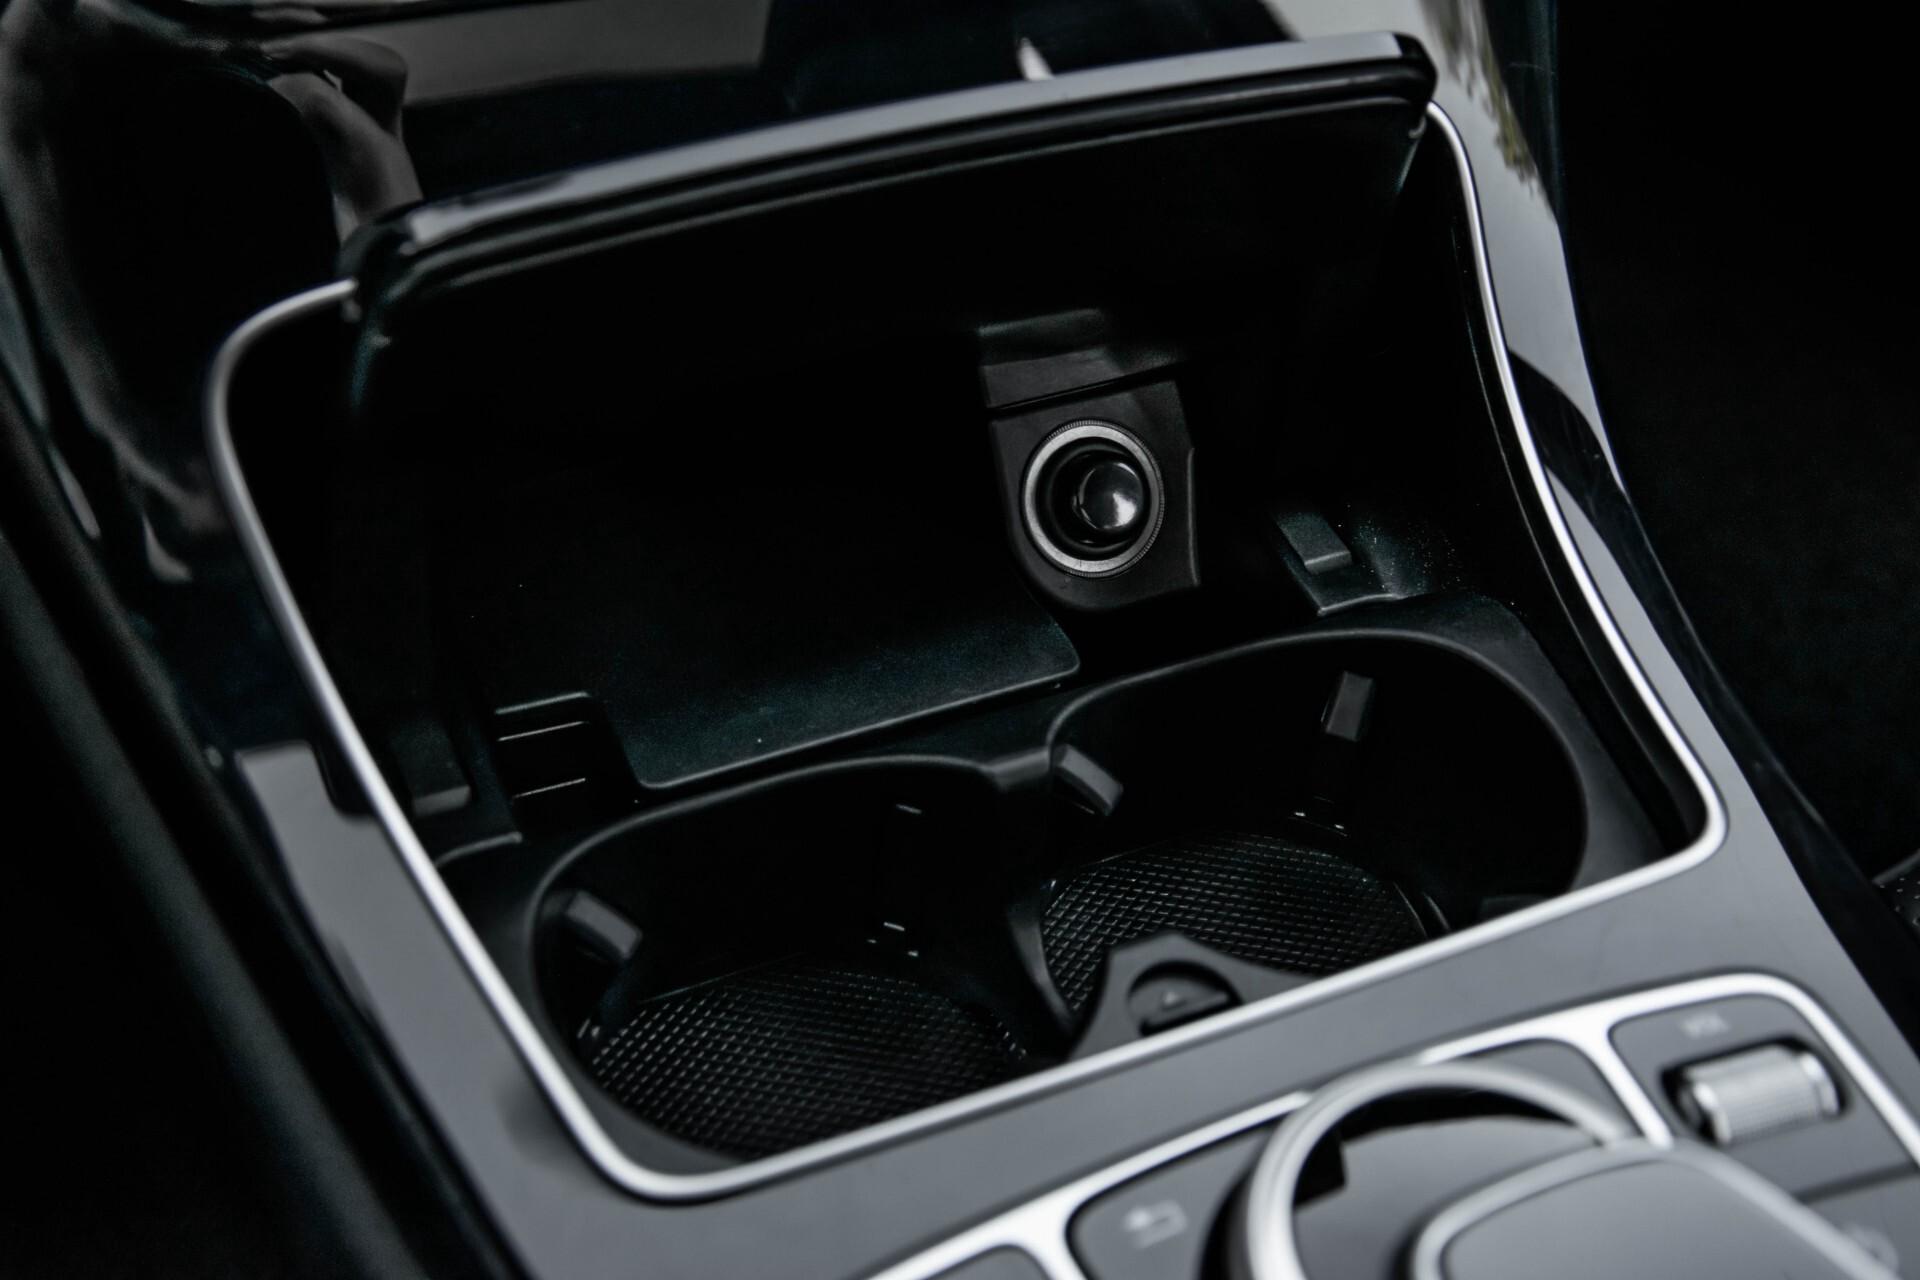 Mercedes-Benz C-Klasse 63 AMG S Panorama/Distronic/Keyless/Comand/Camera/ILS Aut7 Foto 51